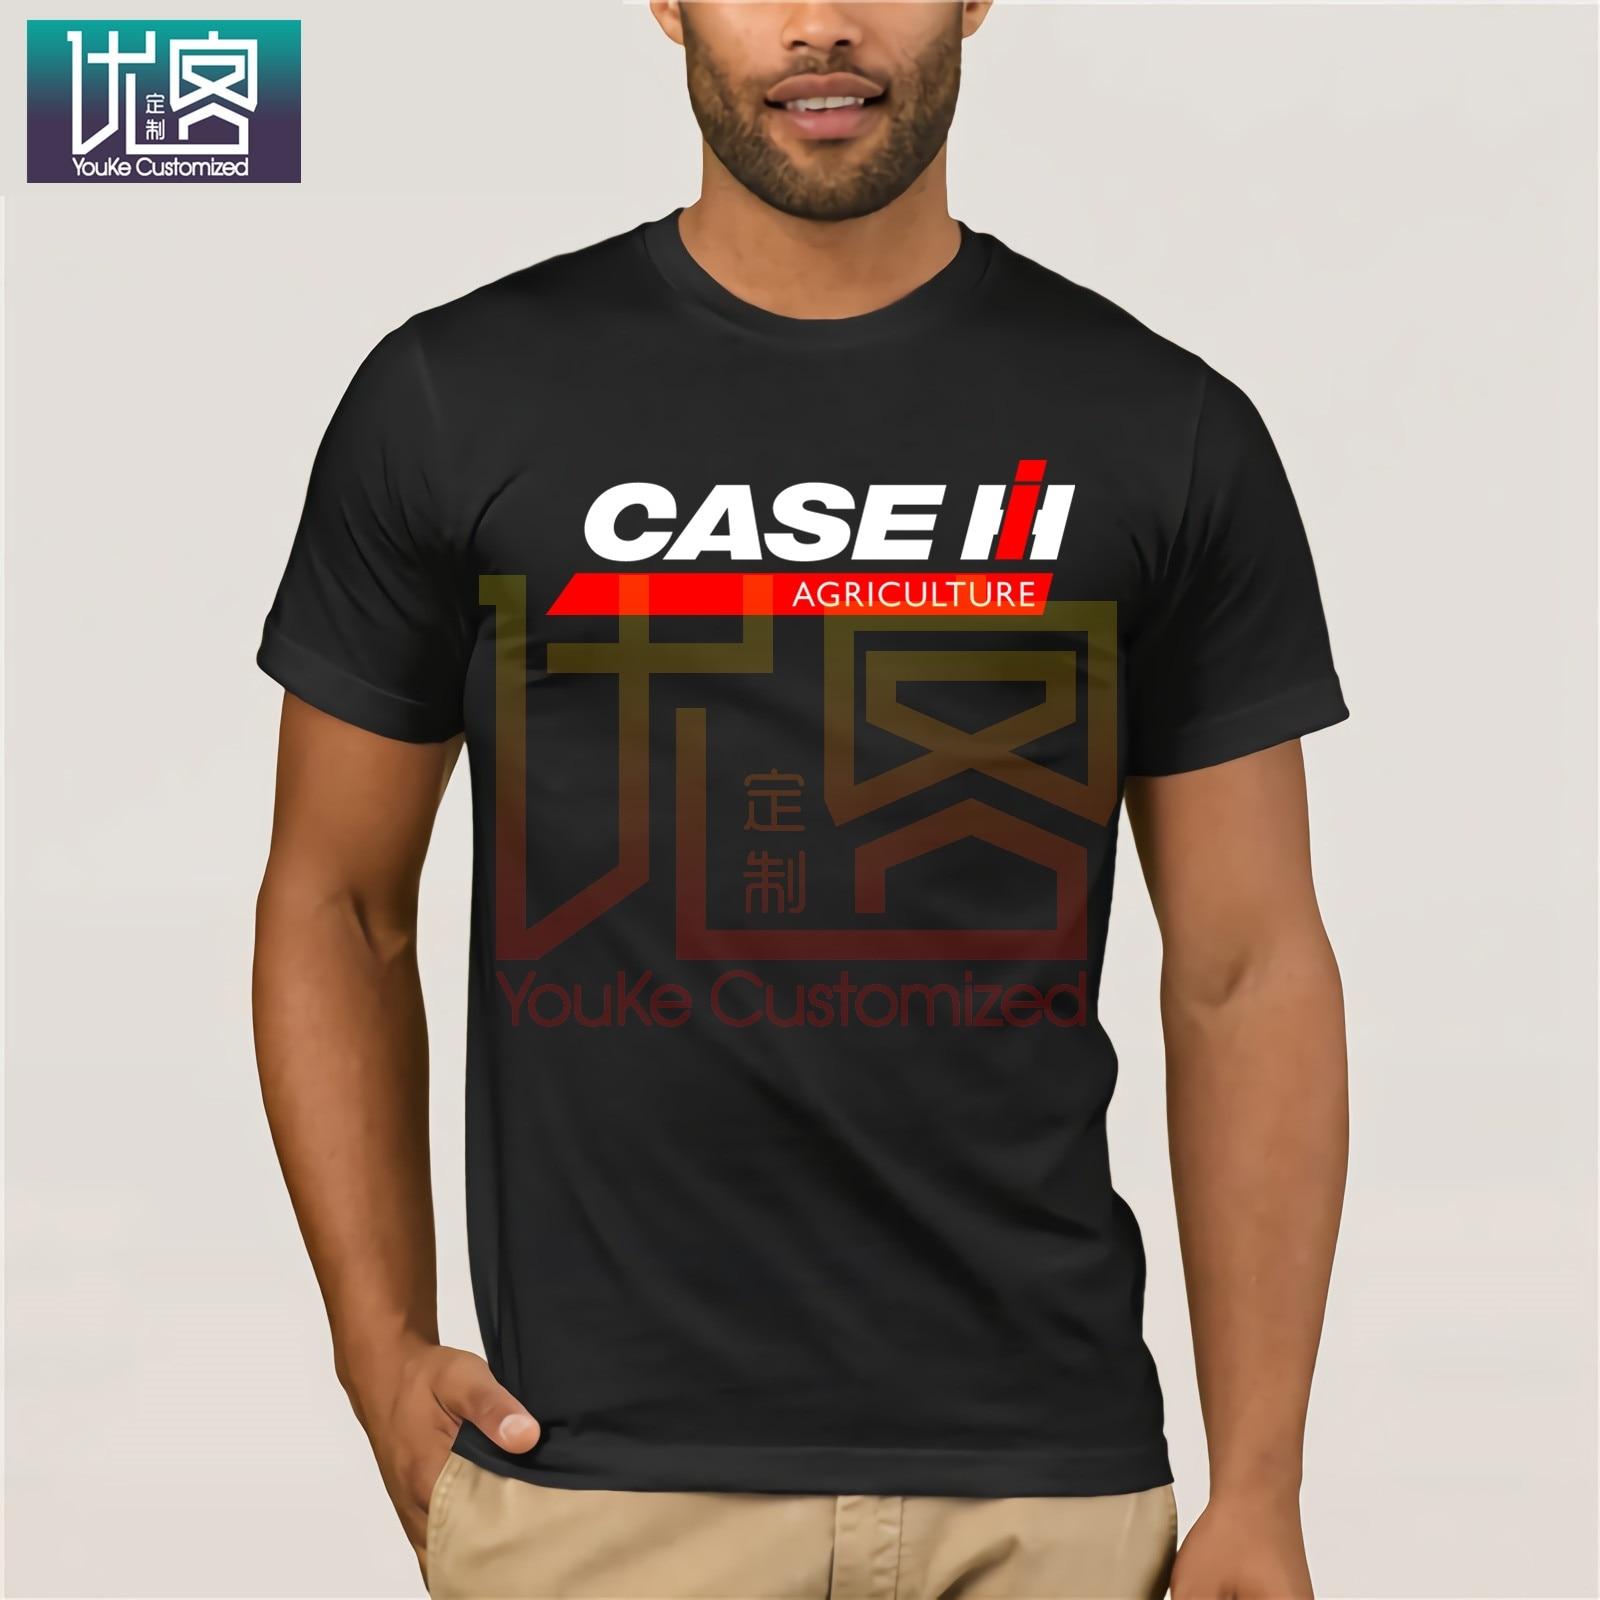 Tops Cool T Shirt O-Neck Short New Case Ih Tractor Agriculture Logo Men's Black T-Shirt Size S 3XL Design T Shirts For Men